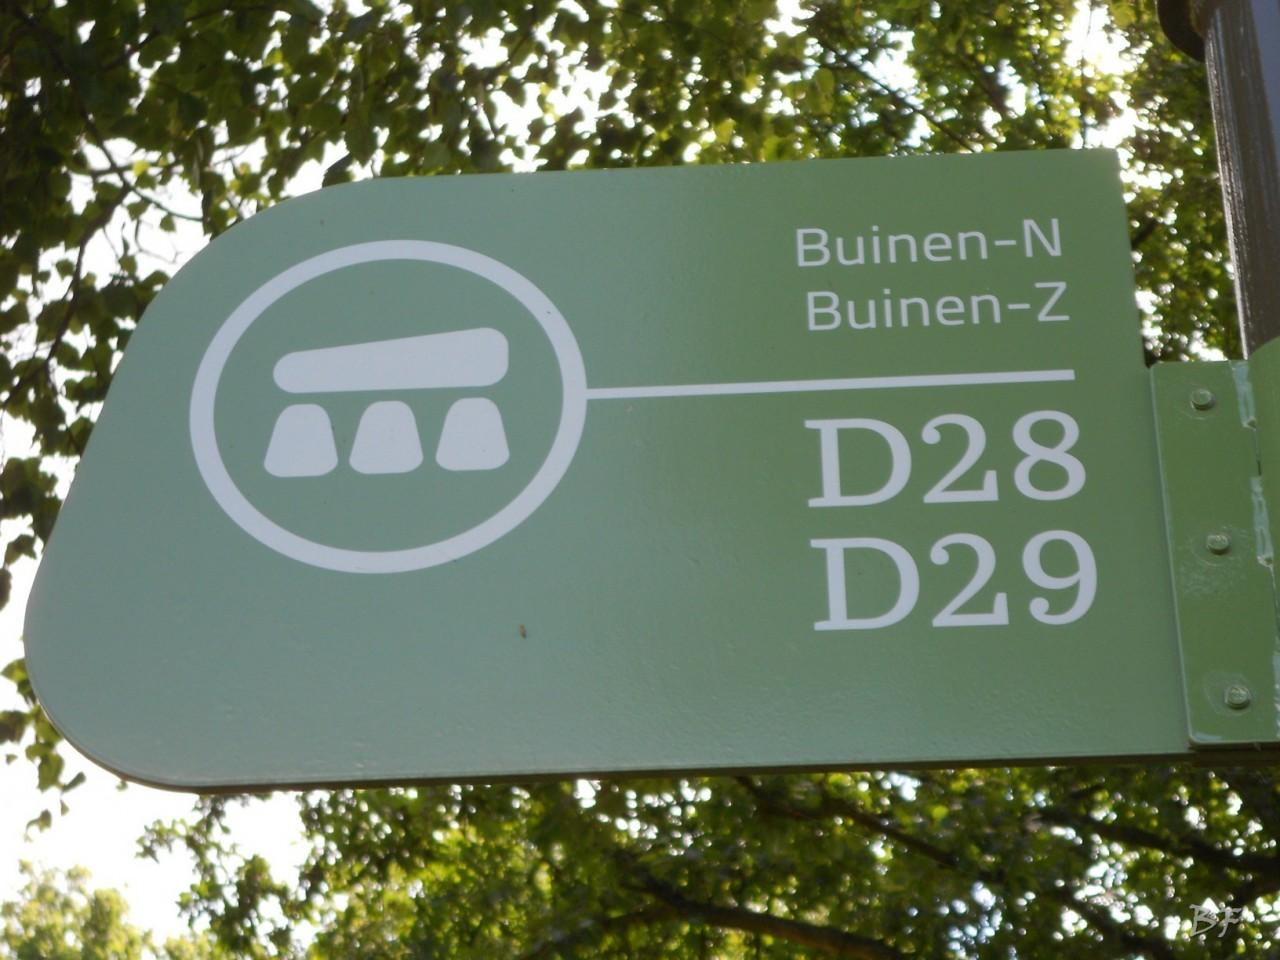 Hunebedden-Dolmen-Megaliti-Groeningen-Drenthe-Paesi-Bassi-80